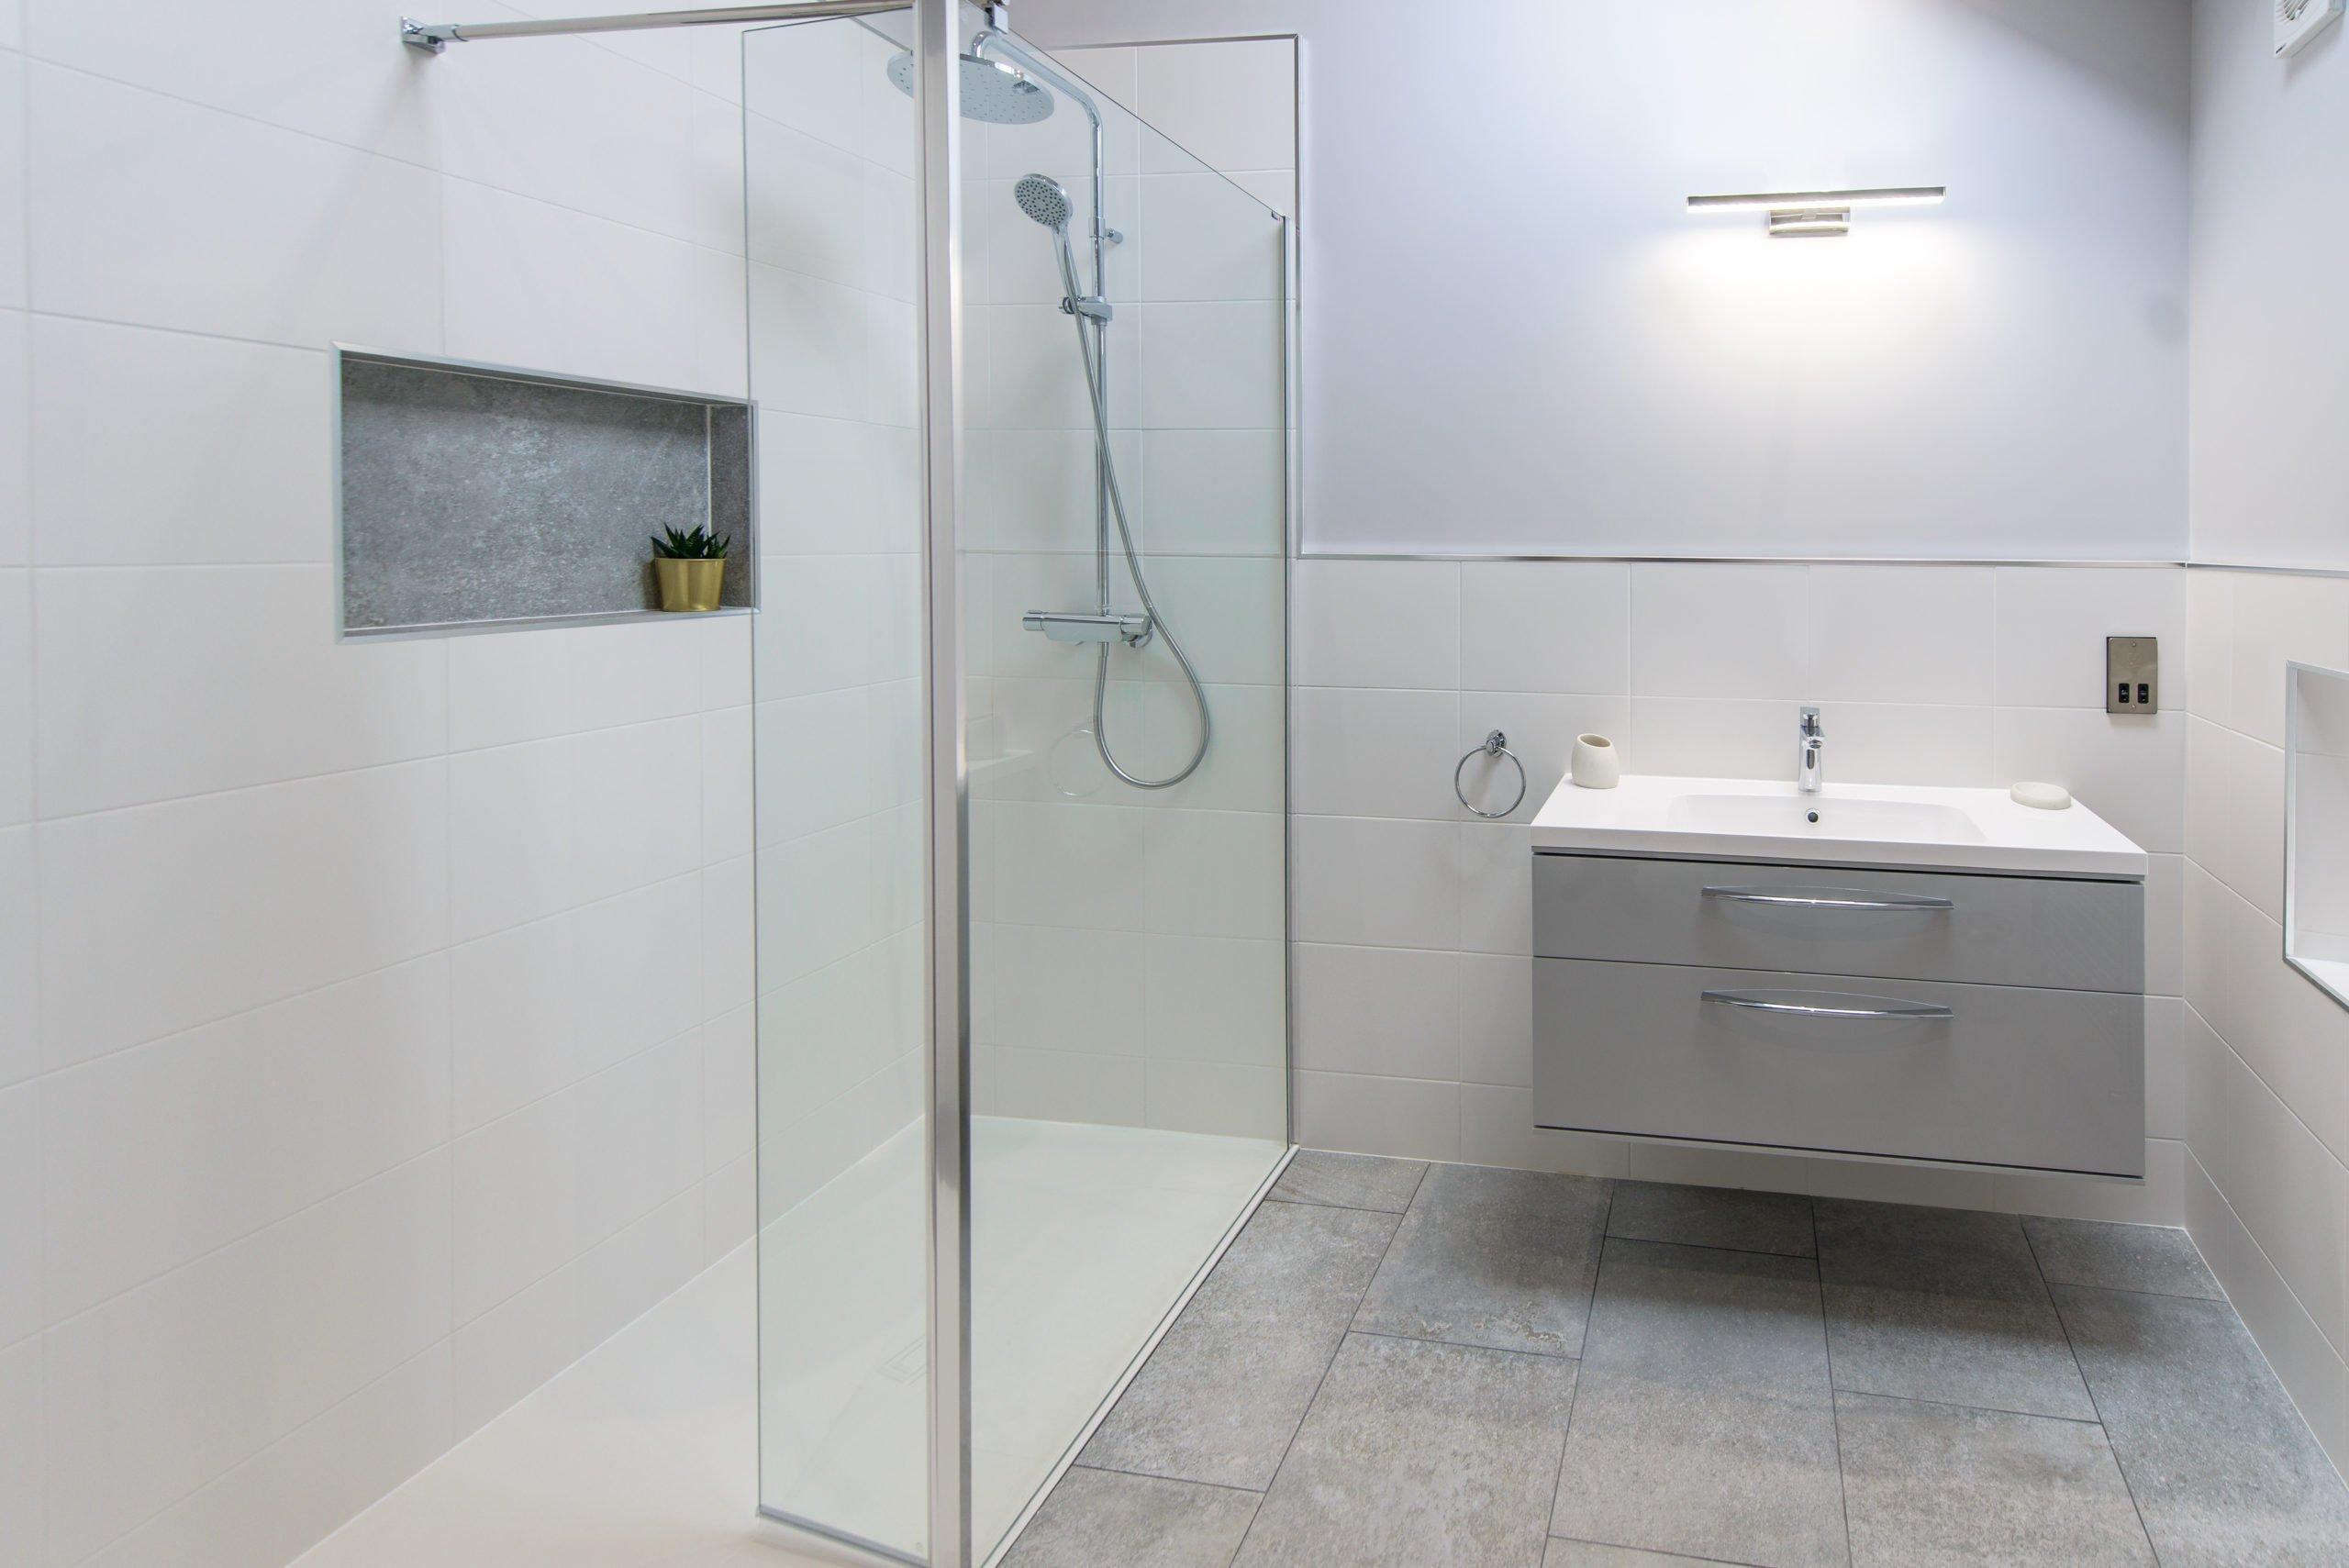 Aqualisa Dual Head Midas Shower in modern bathroom